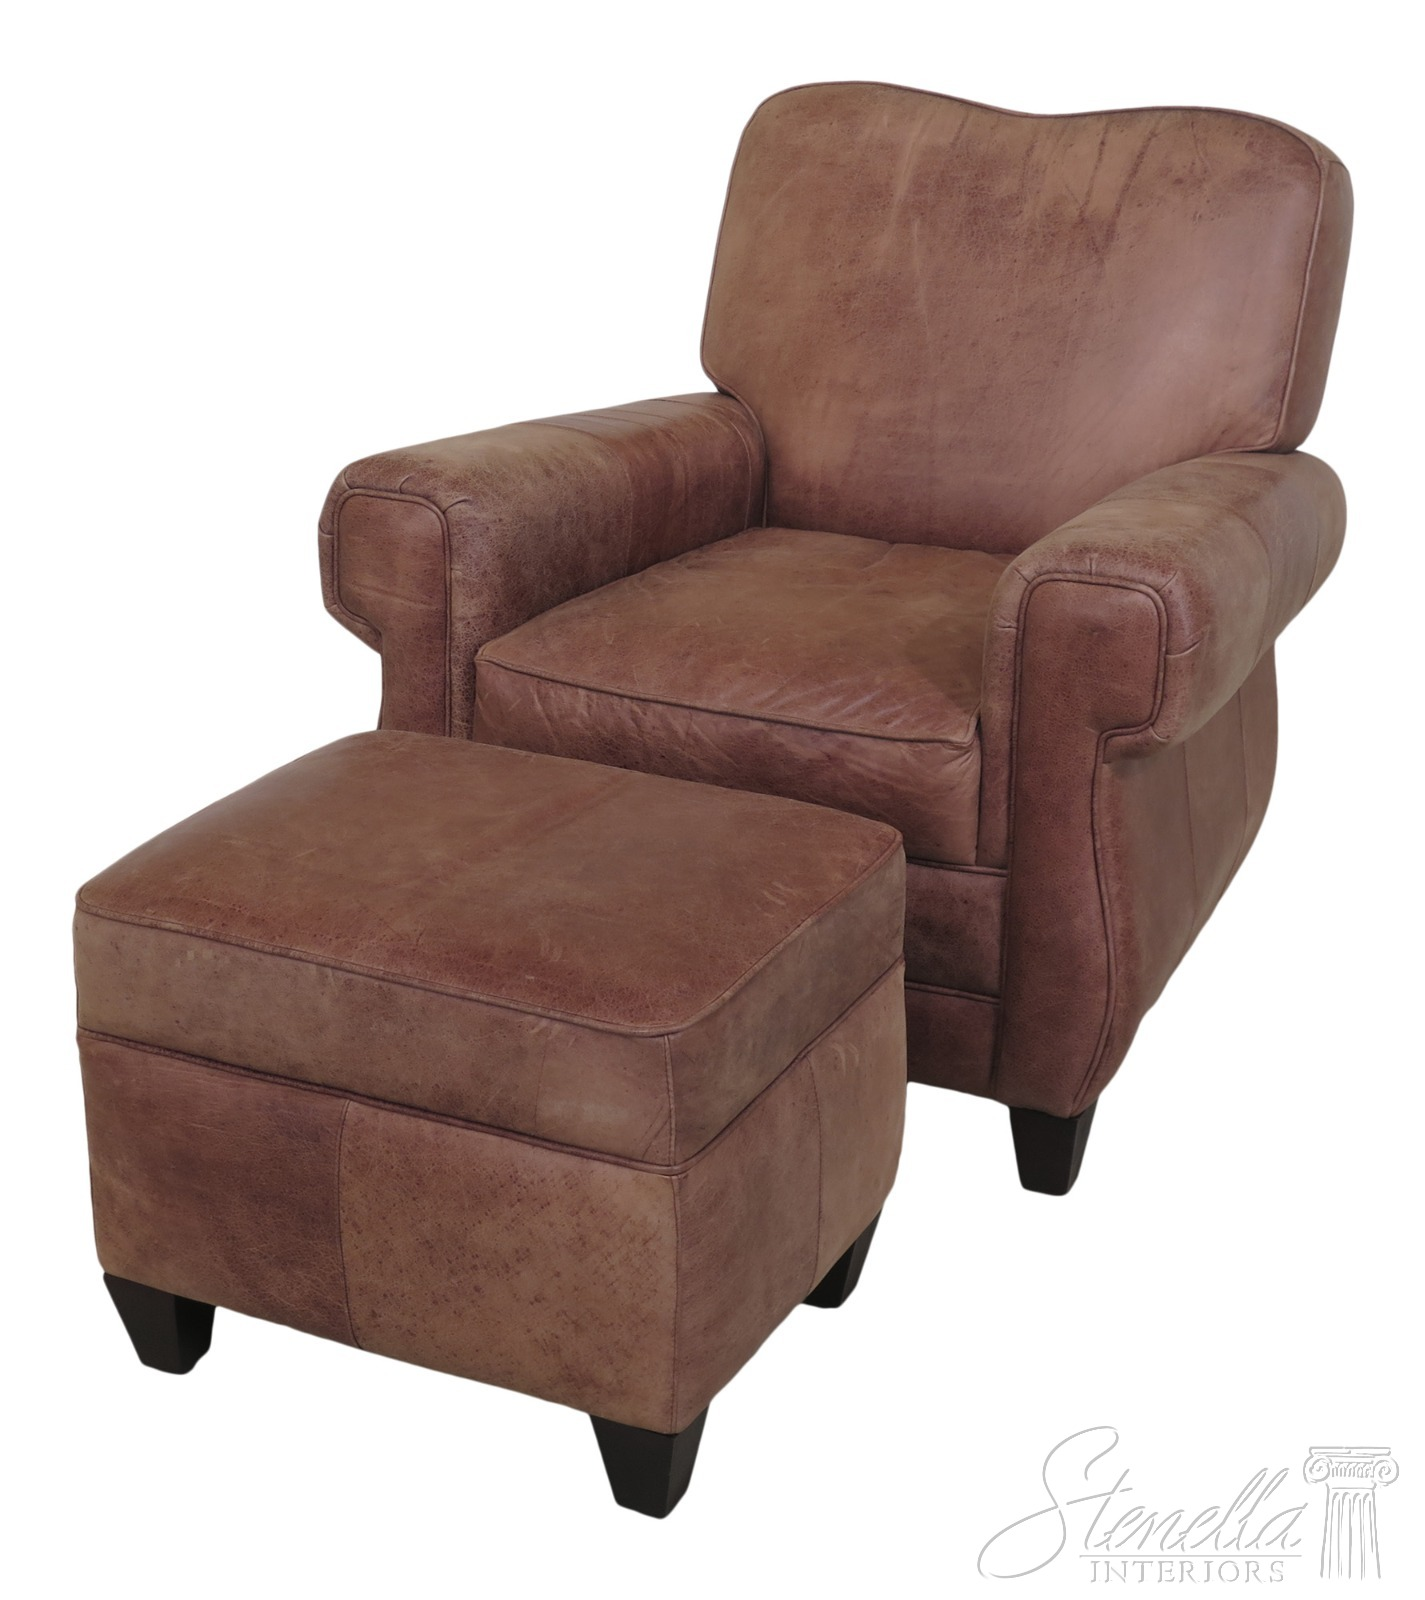 F46653EC: Distressed Leather Chair & Matching Ottoman | eBay